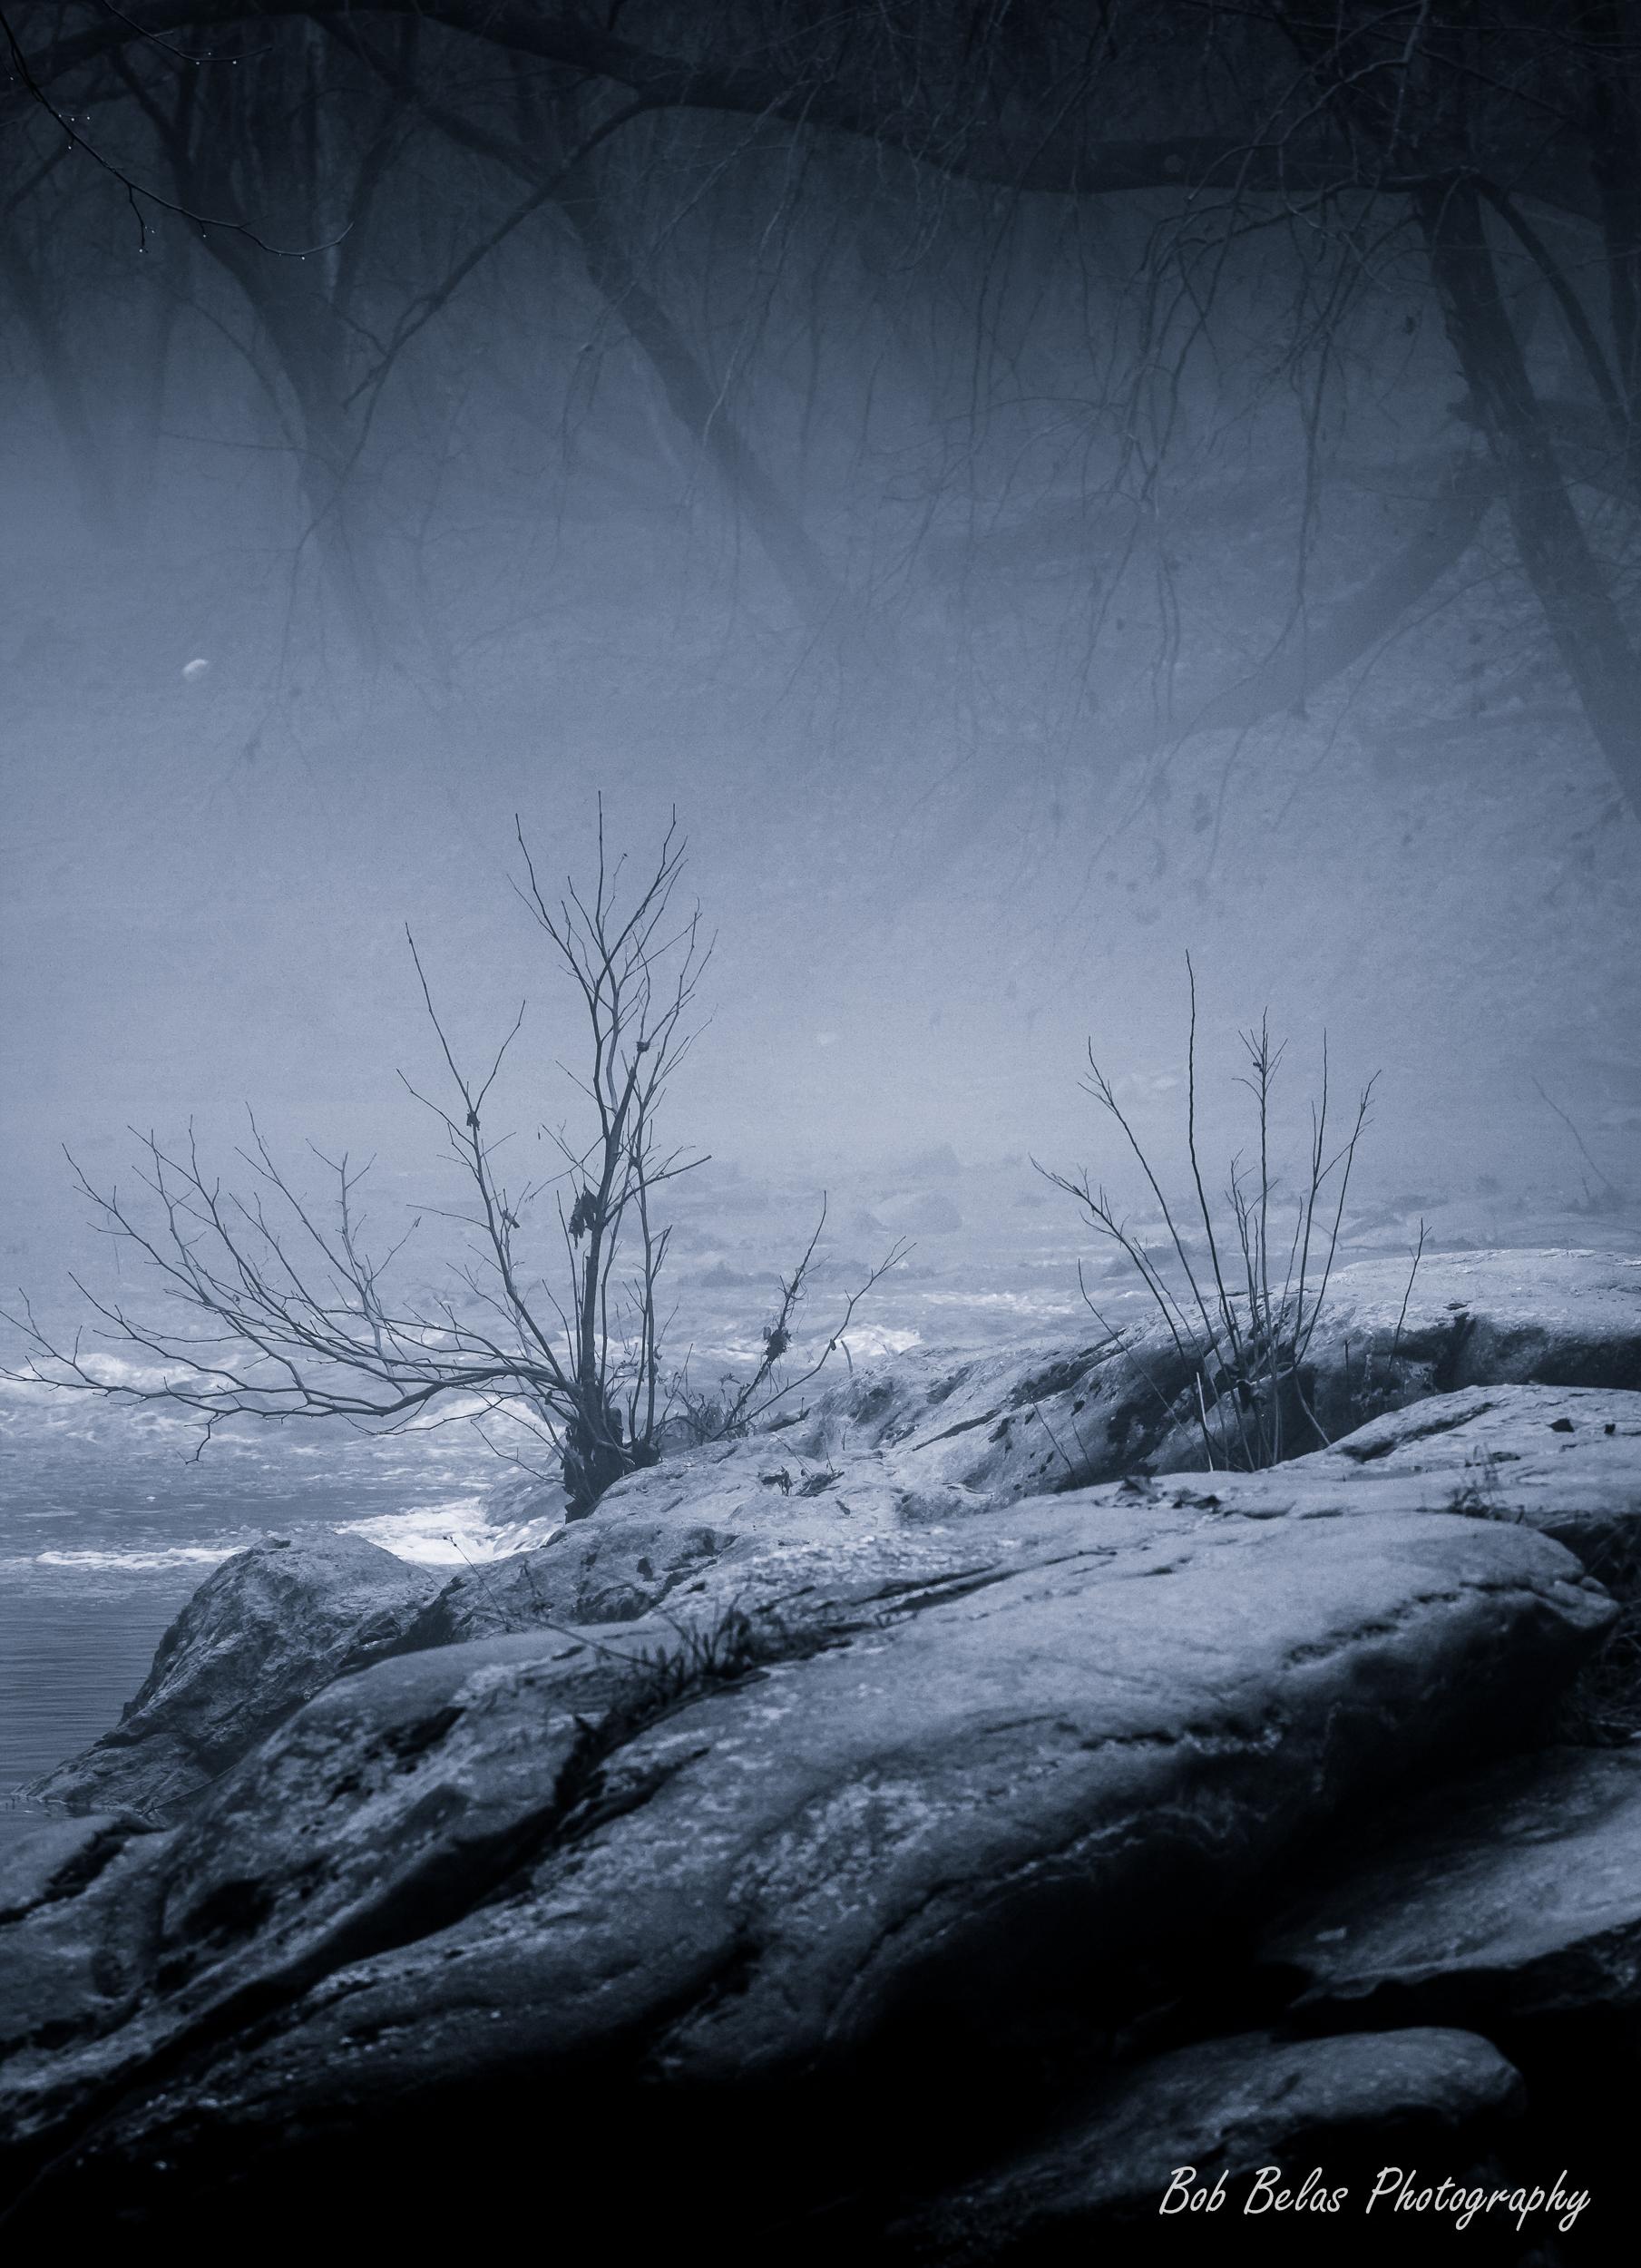 River Fog #4, toned monochrome